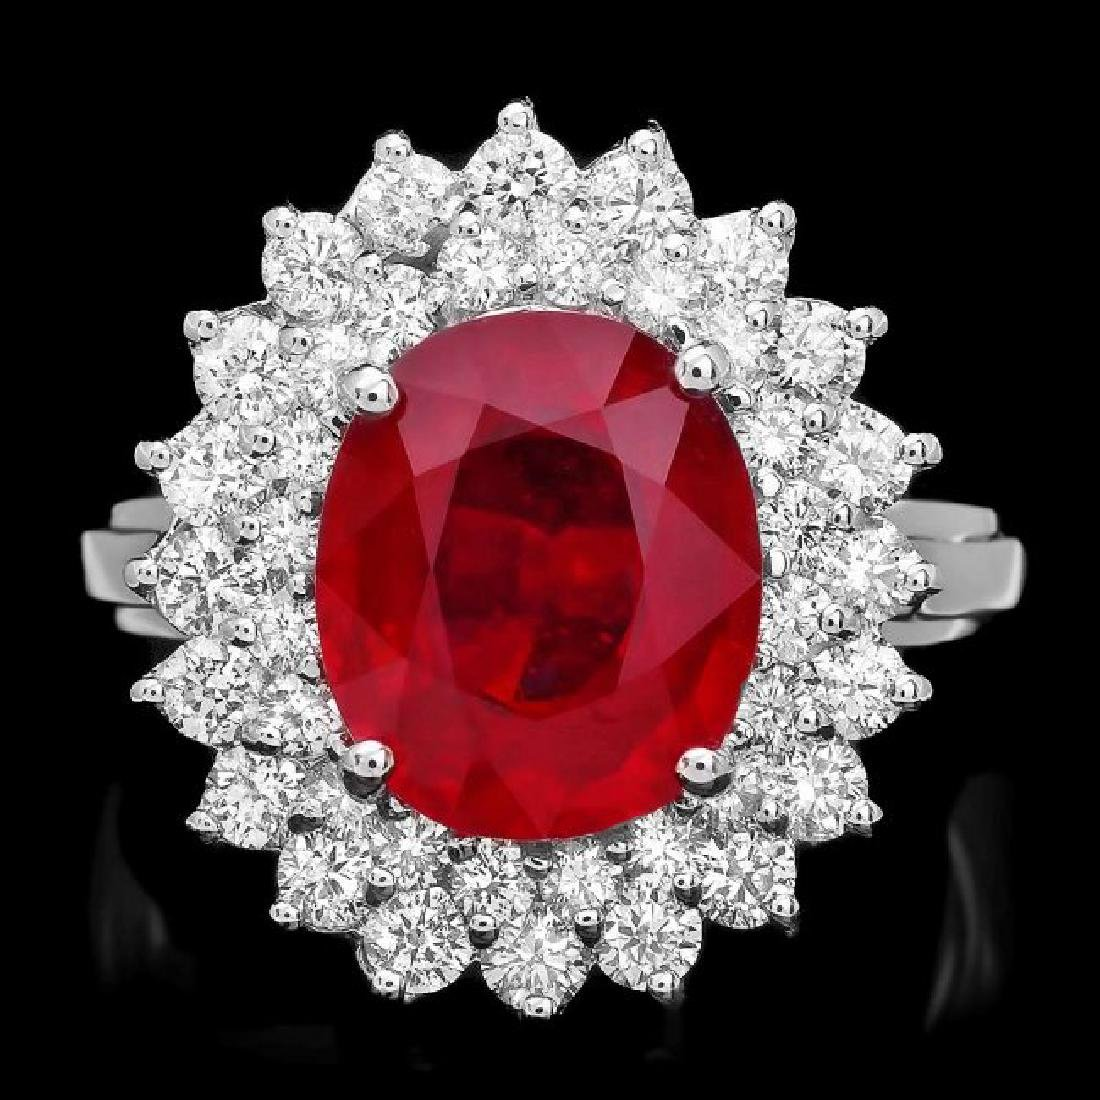 14k White Gold 4.50ct Ruby 1.40ct Diamond Ring